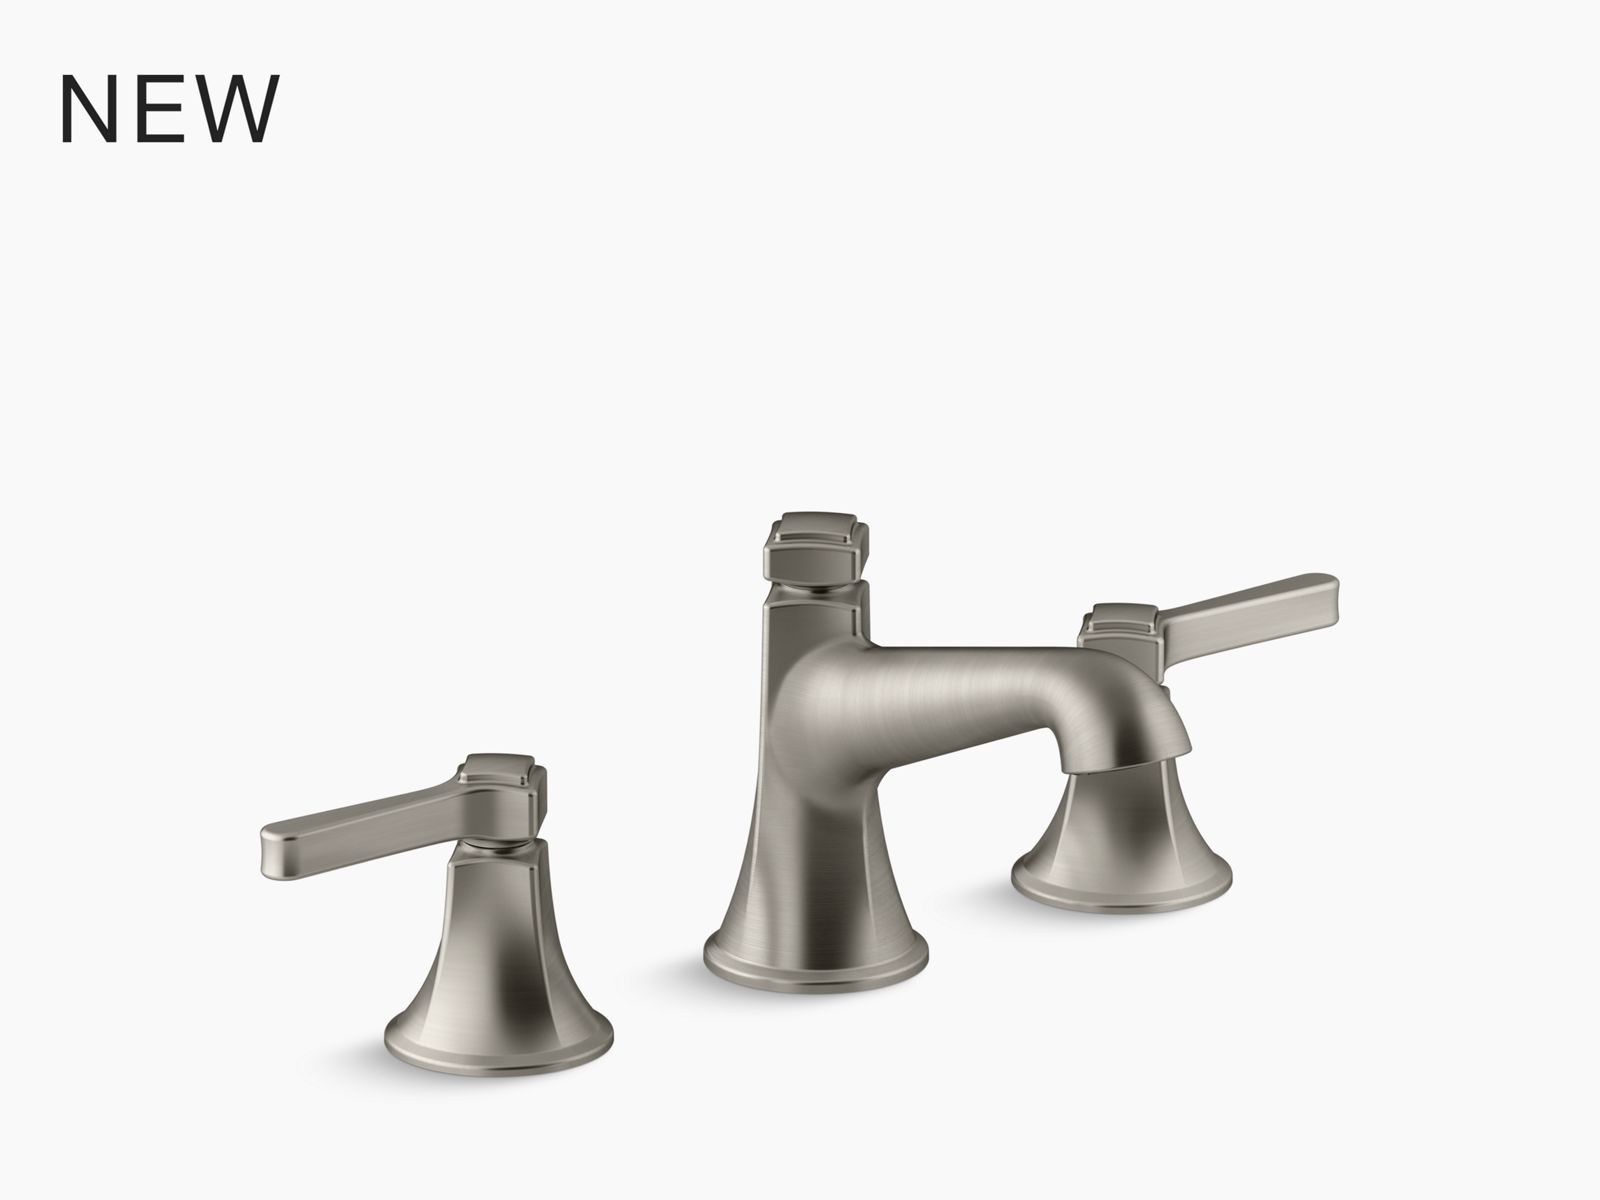 riverby 33 x 22 x 9 5 8 undermount single bowl workstation kitchen sink with accessories